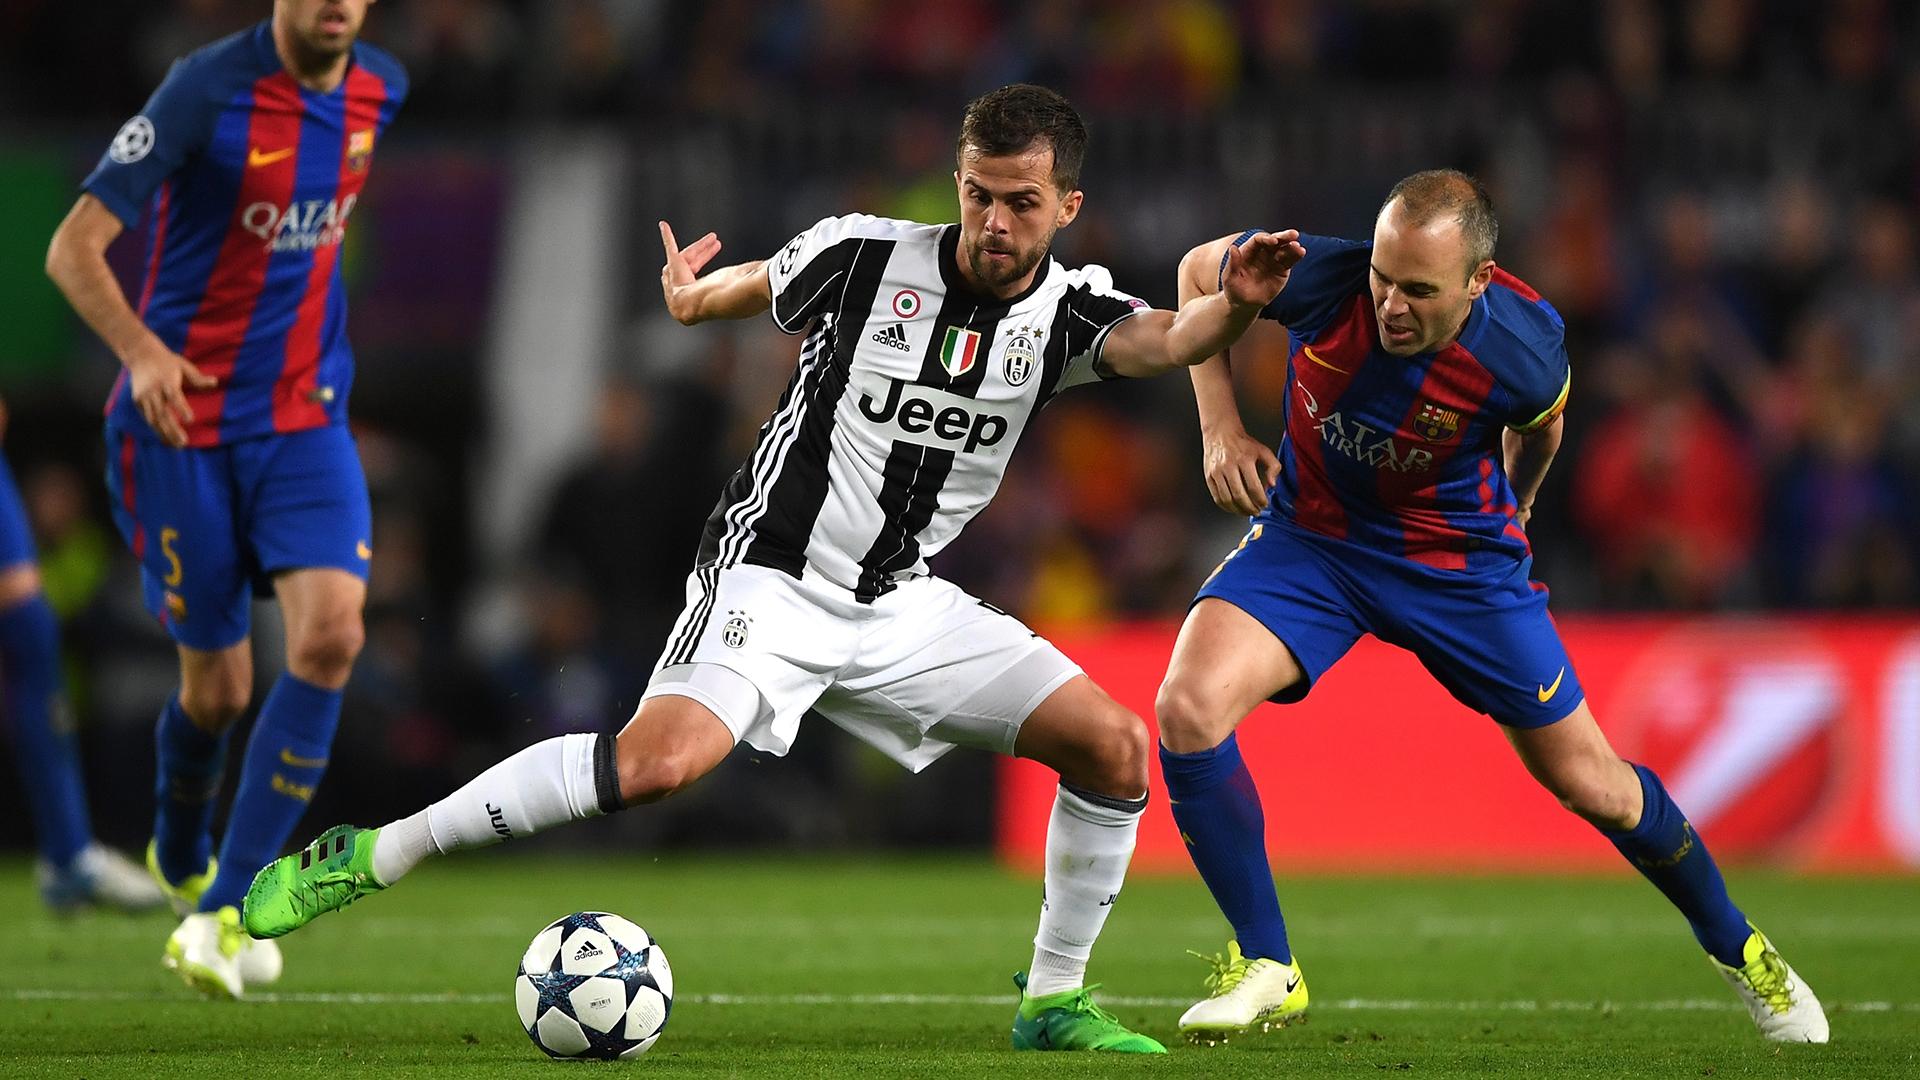 Miralem Pjanic Juventus Barcelona